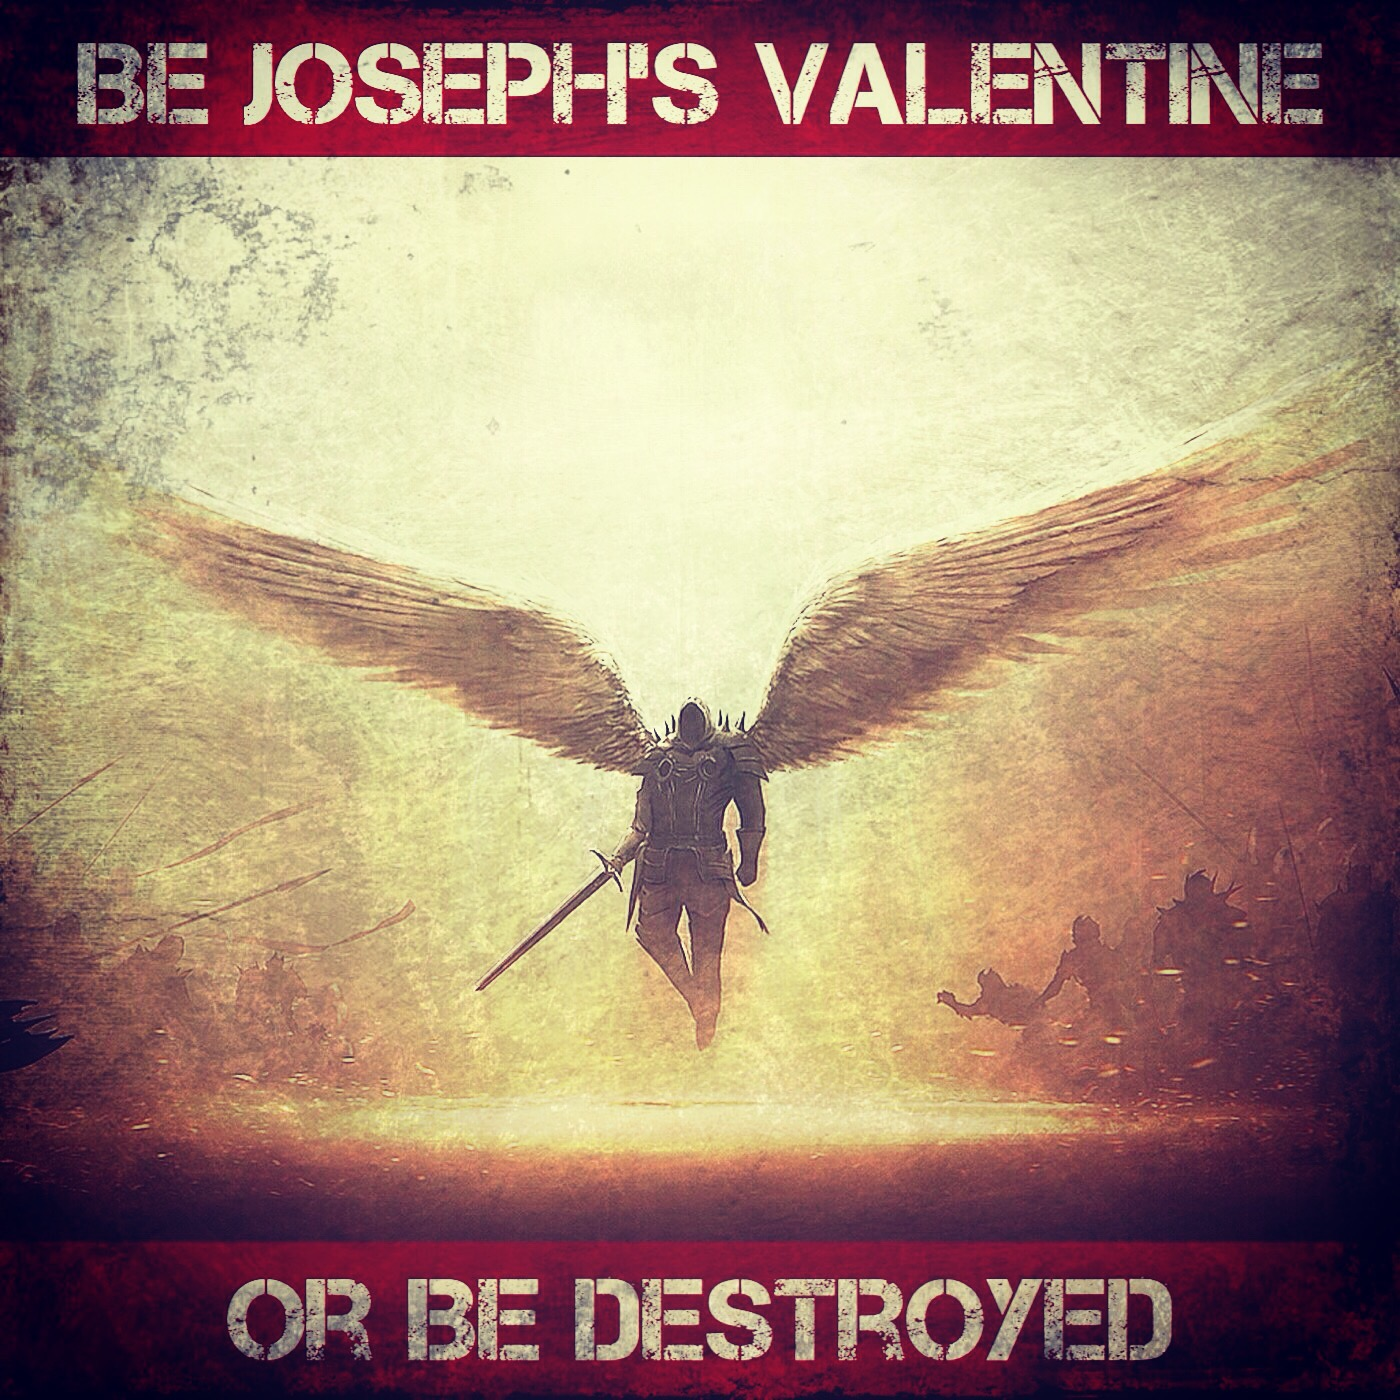 Be Joseph's valentine